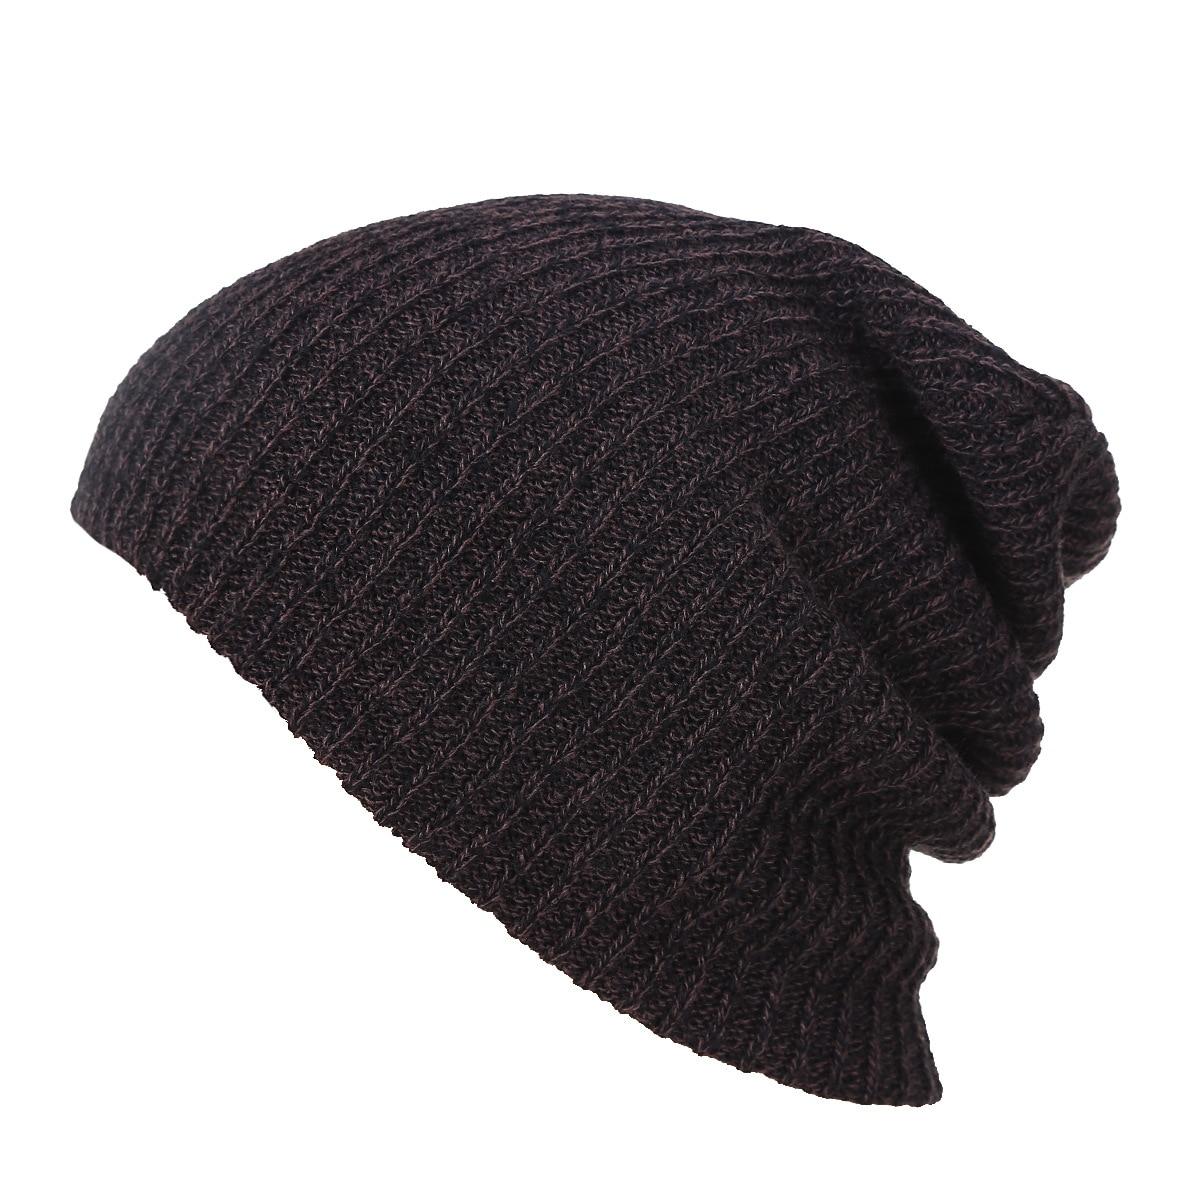 COKK Χειμερινά Καπέλα για Άντρες - Αξεσουάρ ένδυσης - Φωτογραφία 6